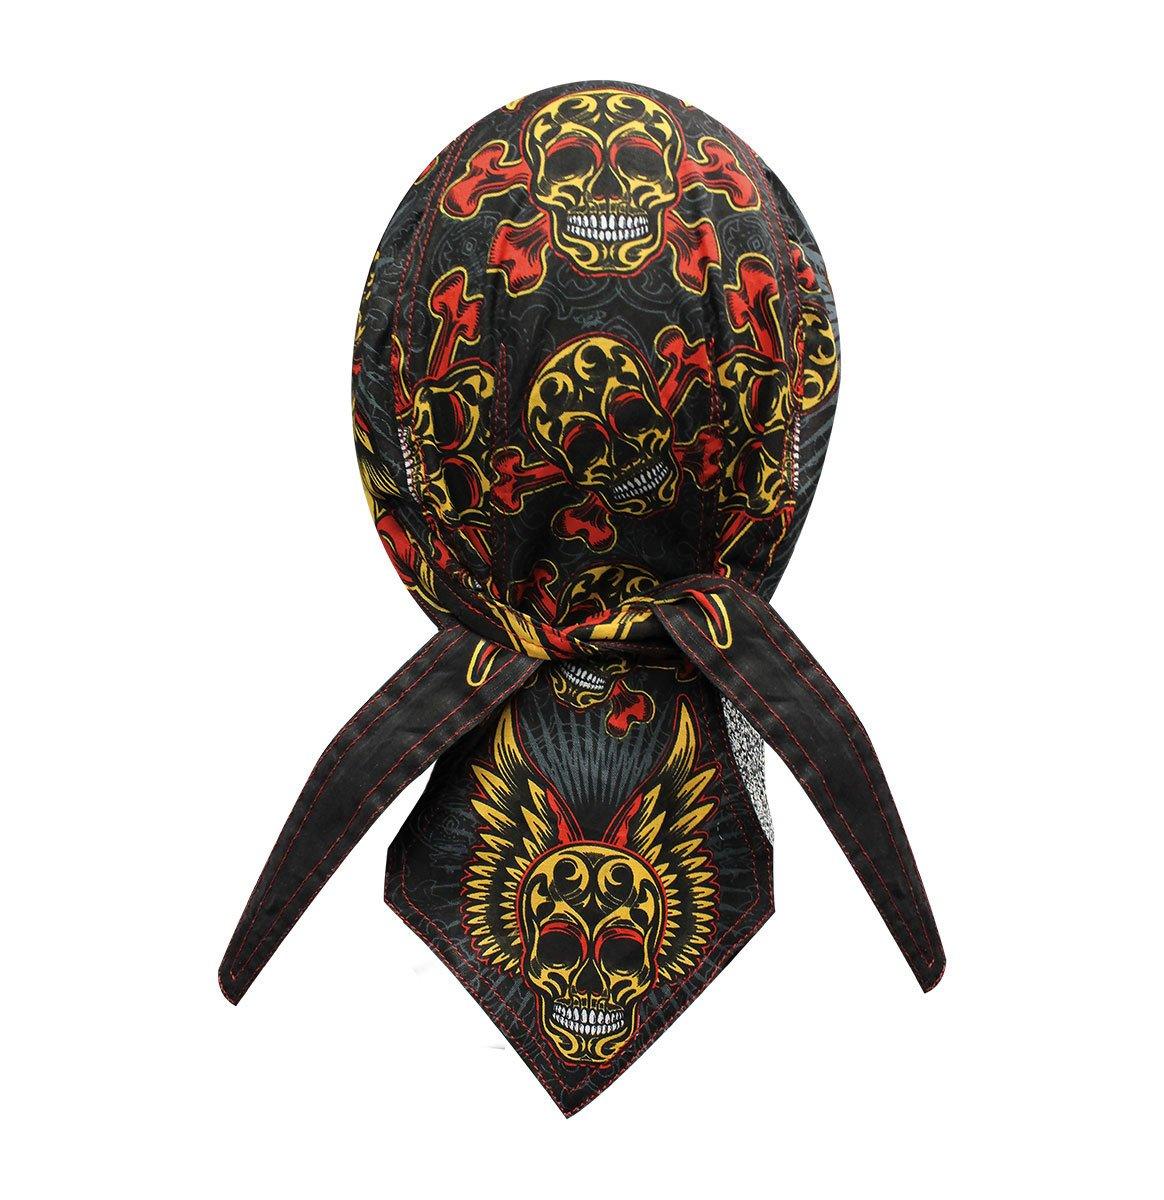 Danbanna Deluxe Tattoo Sugar Wing Skull Durag Head Wrap Biker Skull Cap Helmet Liner